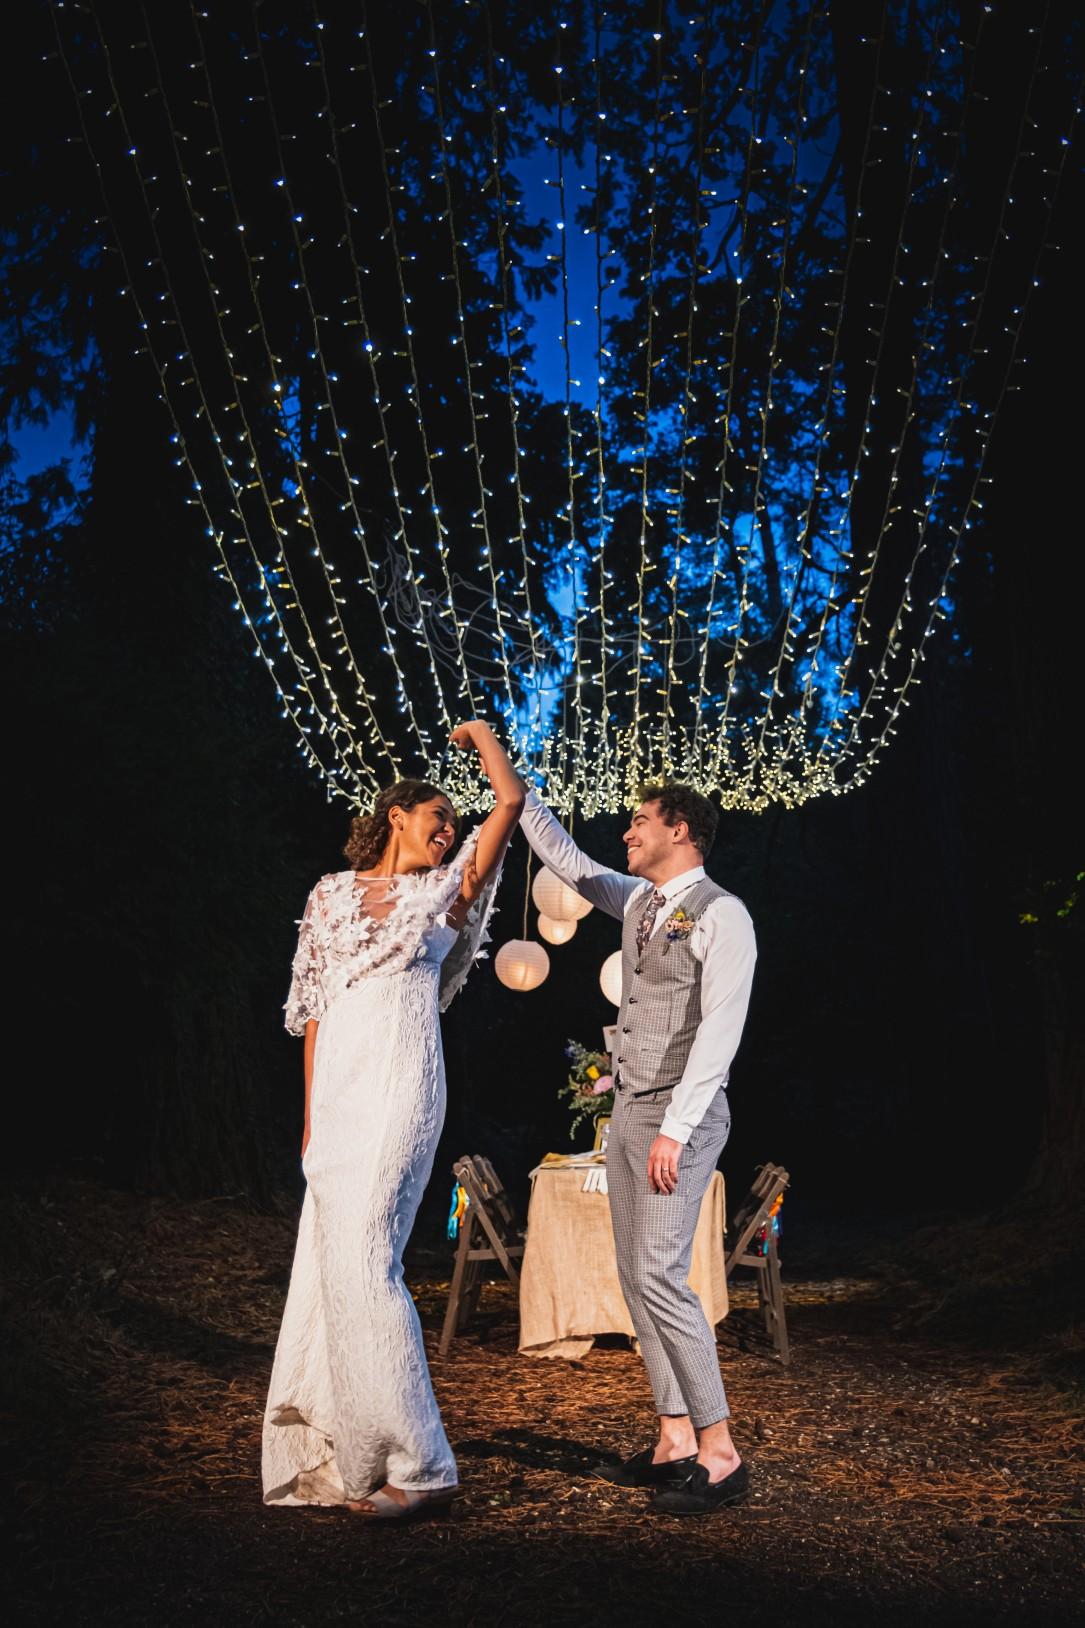 colourful micro wedding at patricks barn - bride and groom dancing - outdoor wedding - boho wedding